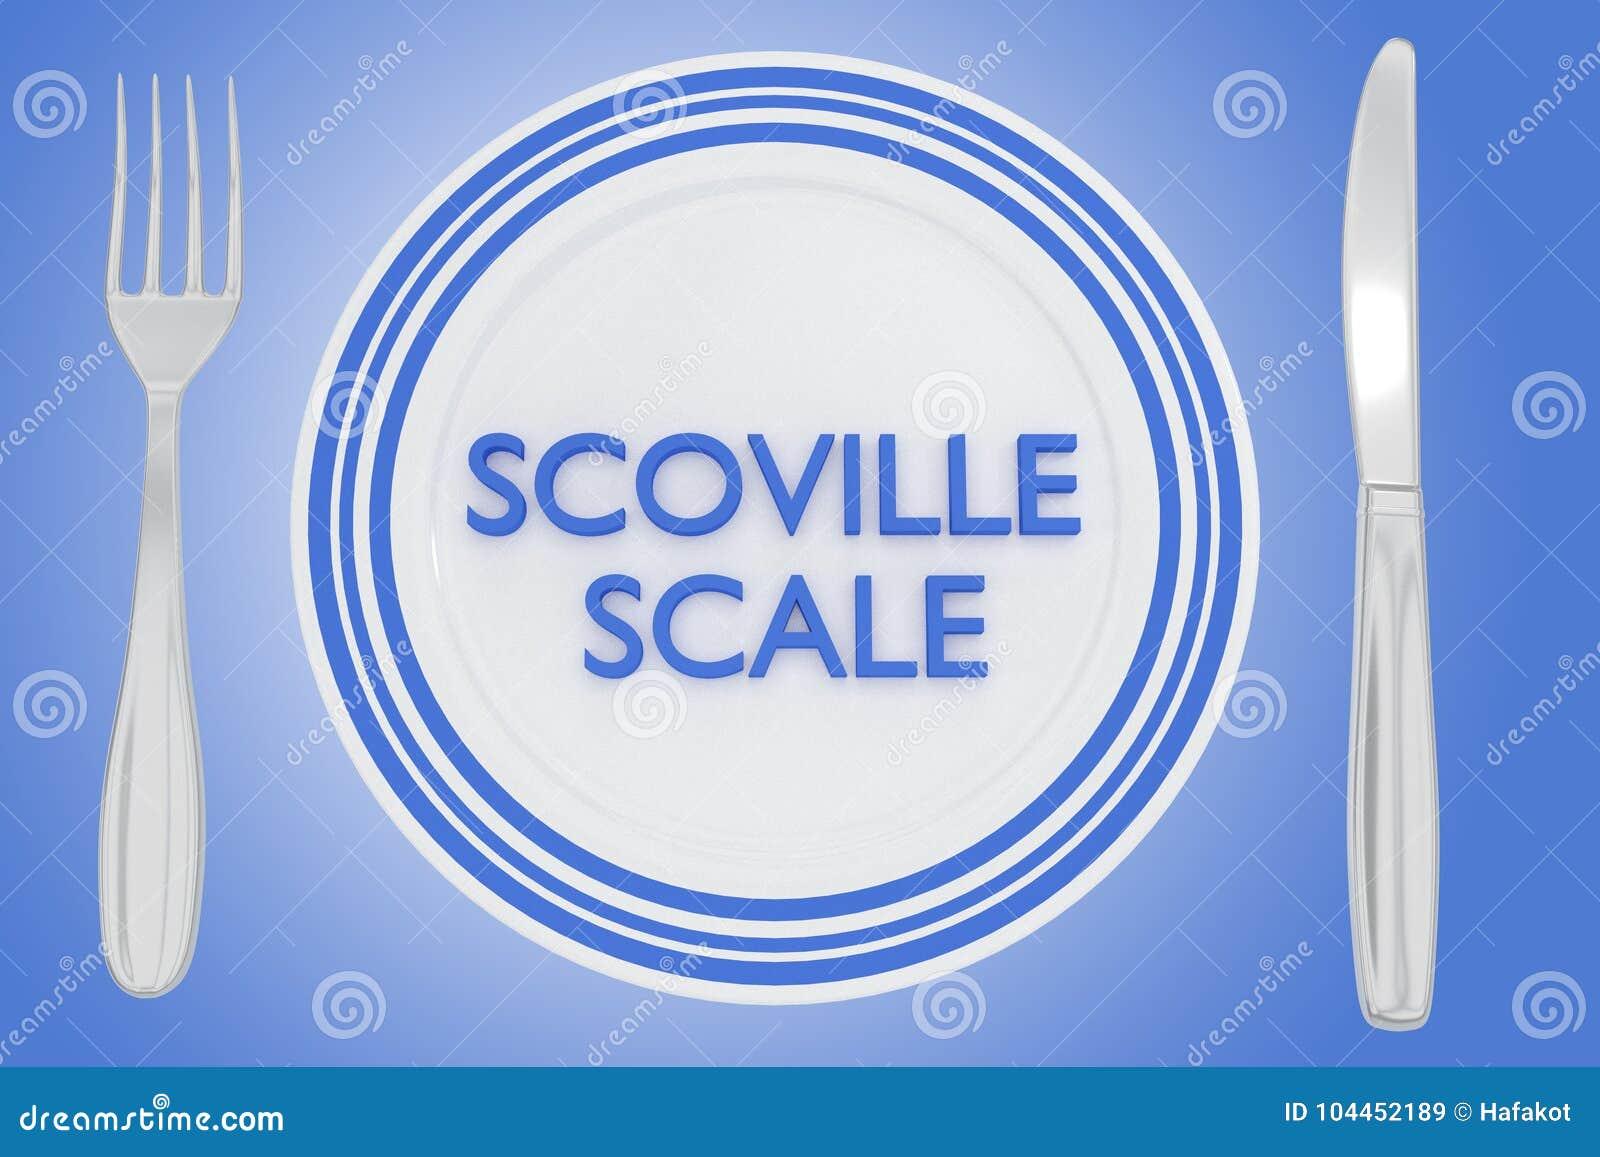 Scoville Scale concept stock illustration  Illustration of